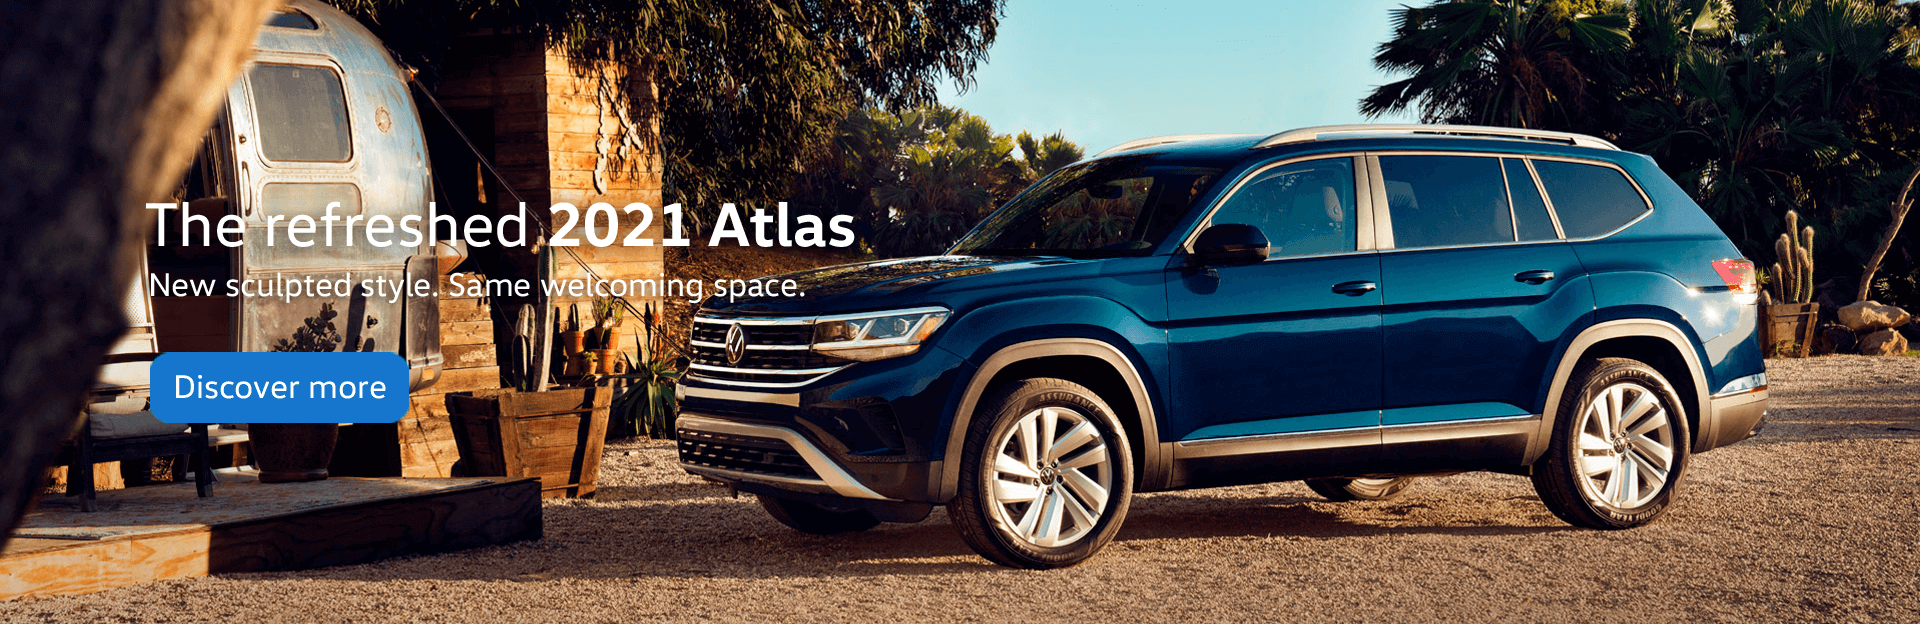 ATLAS-new